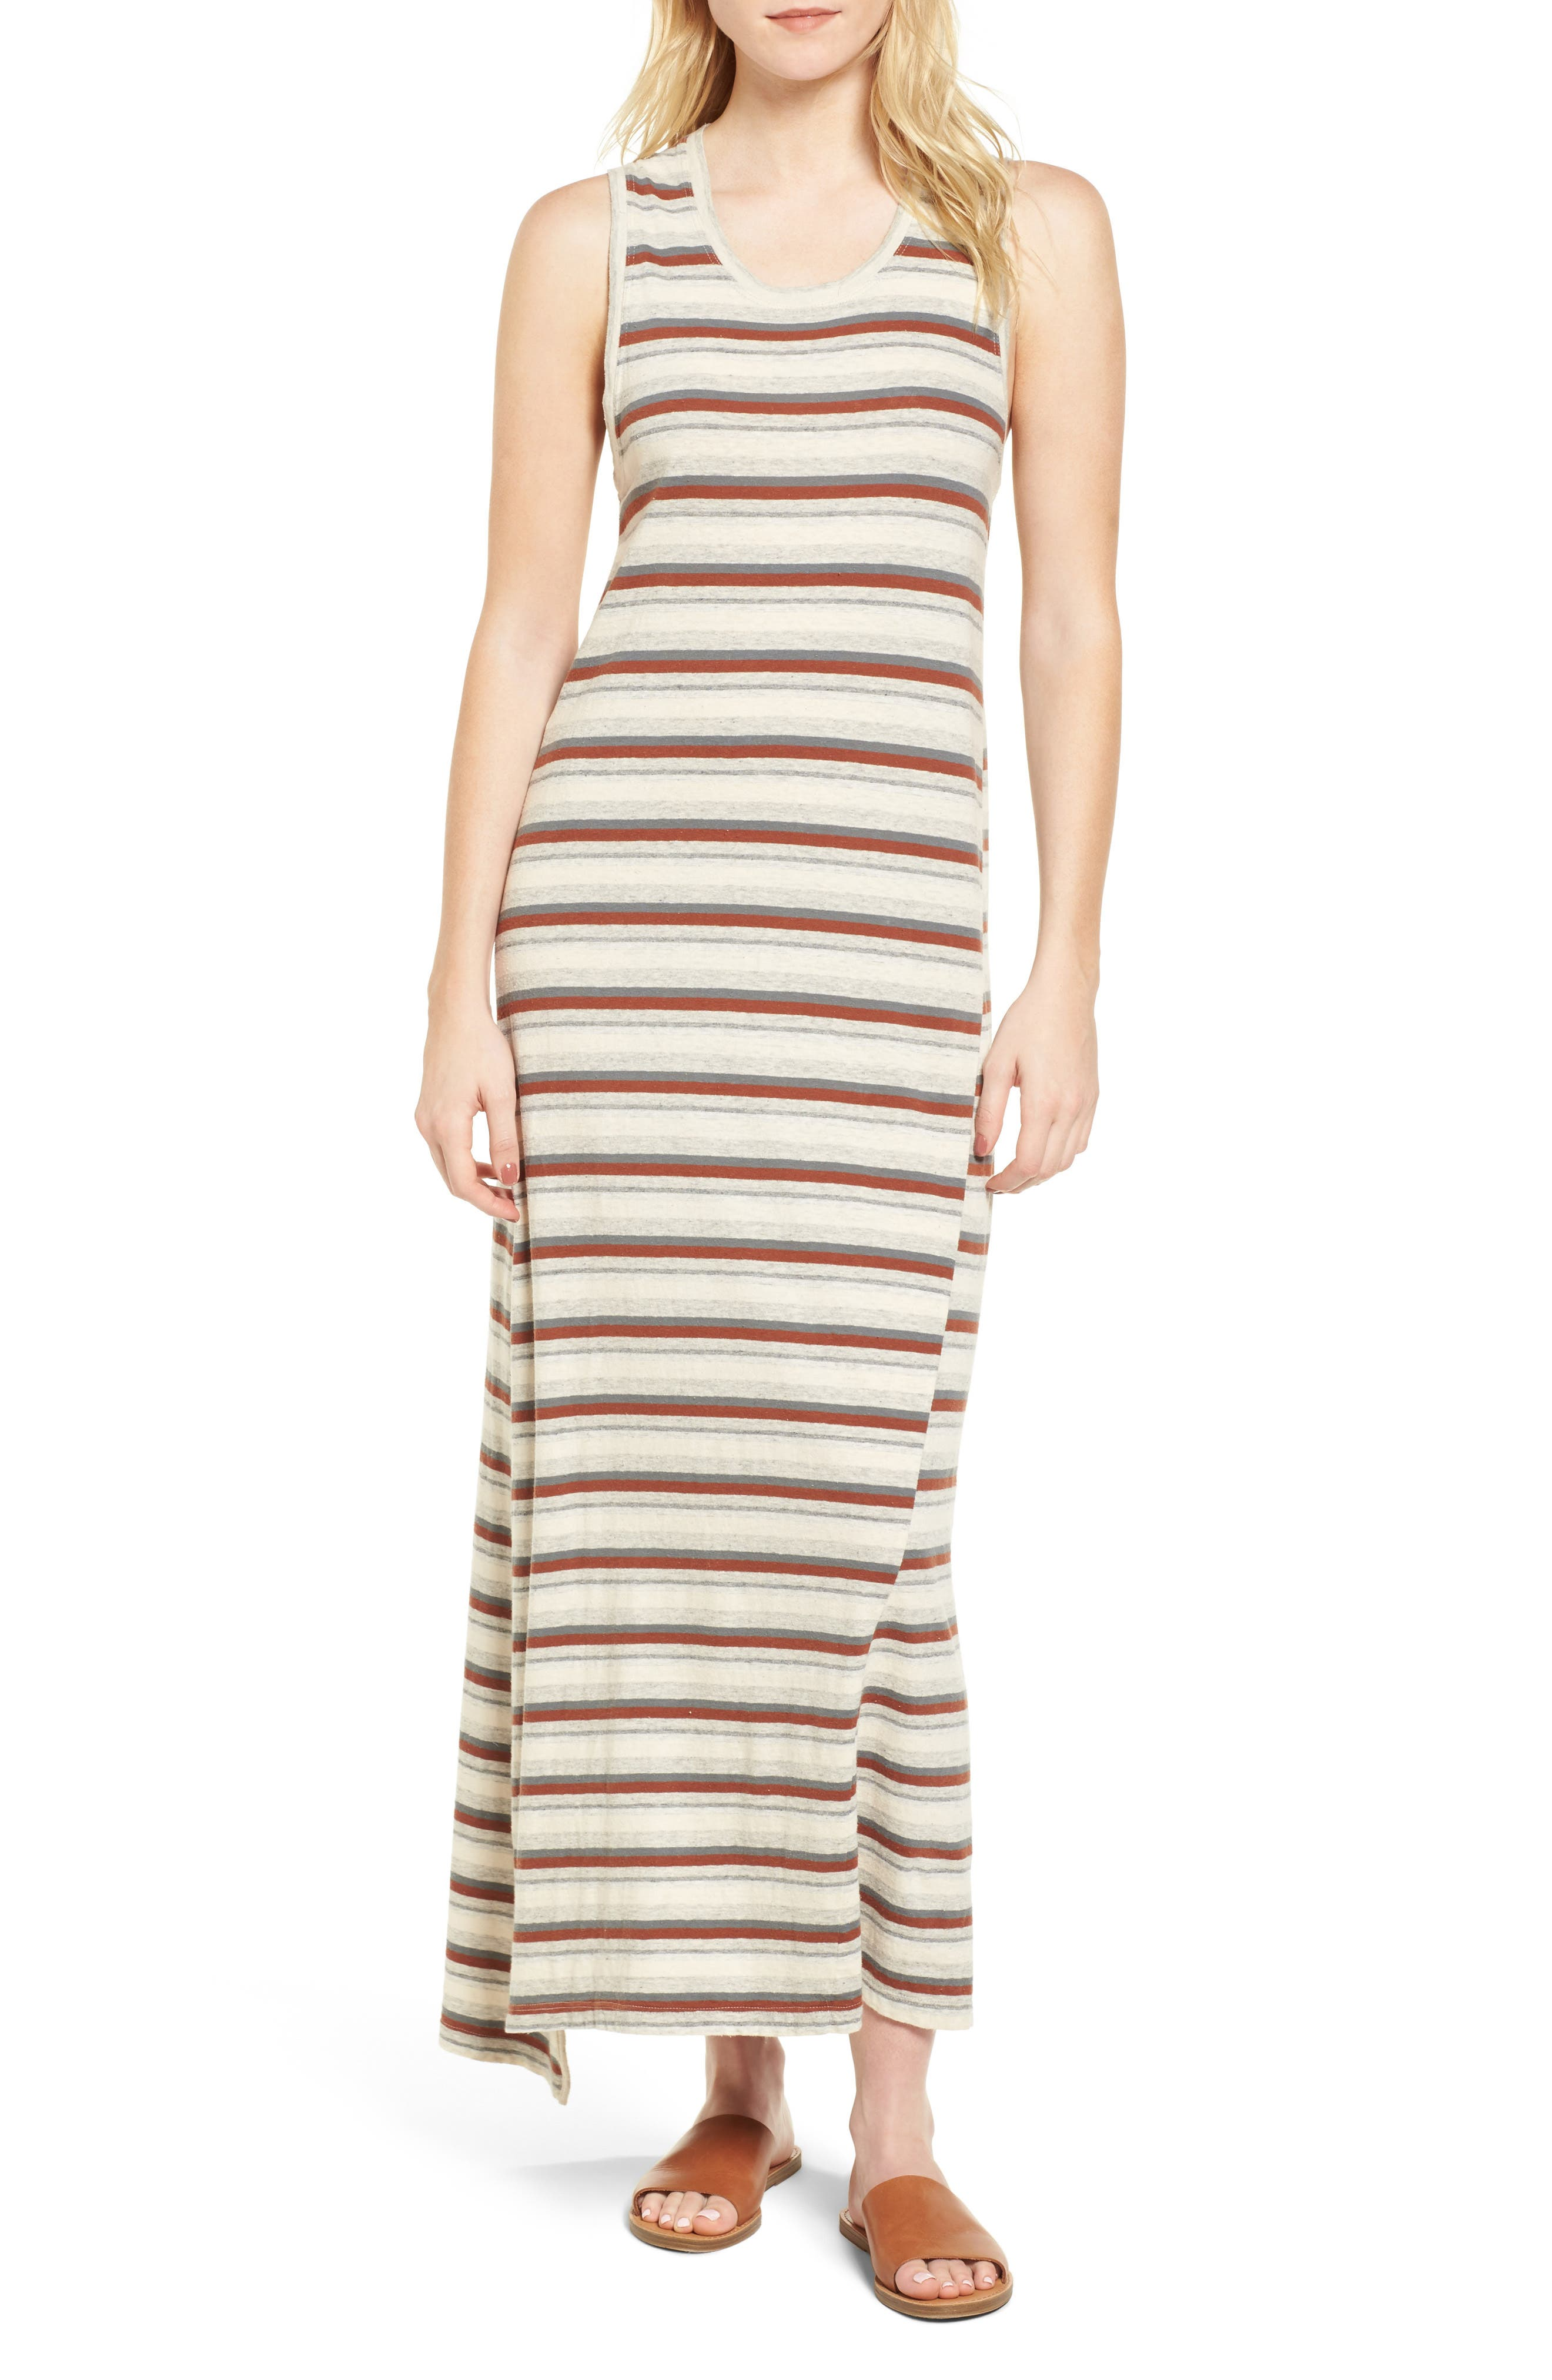 Alternate Image 1 Selected - James Perse Sleeveless Stripe Dress